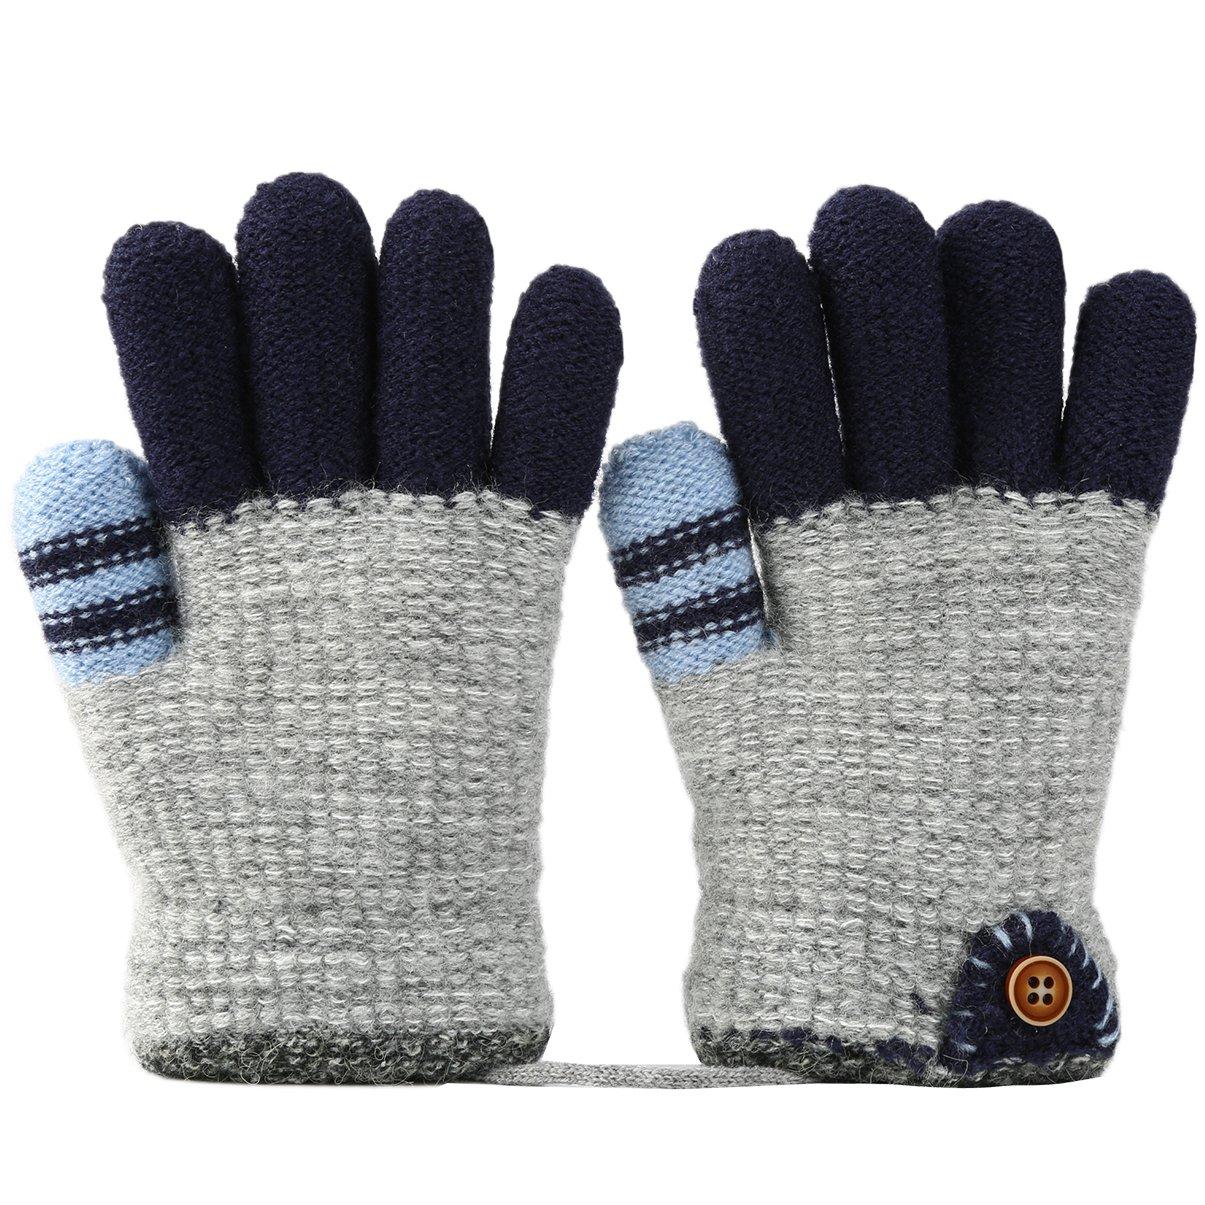 VBG VBIGER Kids Winter Gloves Girls Boys Warm Knitted Gloves Fleece Lined Full Finger Gloves for Children 4-6 Years Old Color 1)